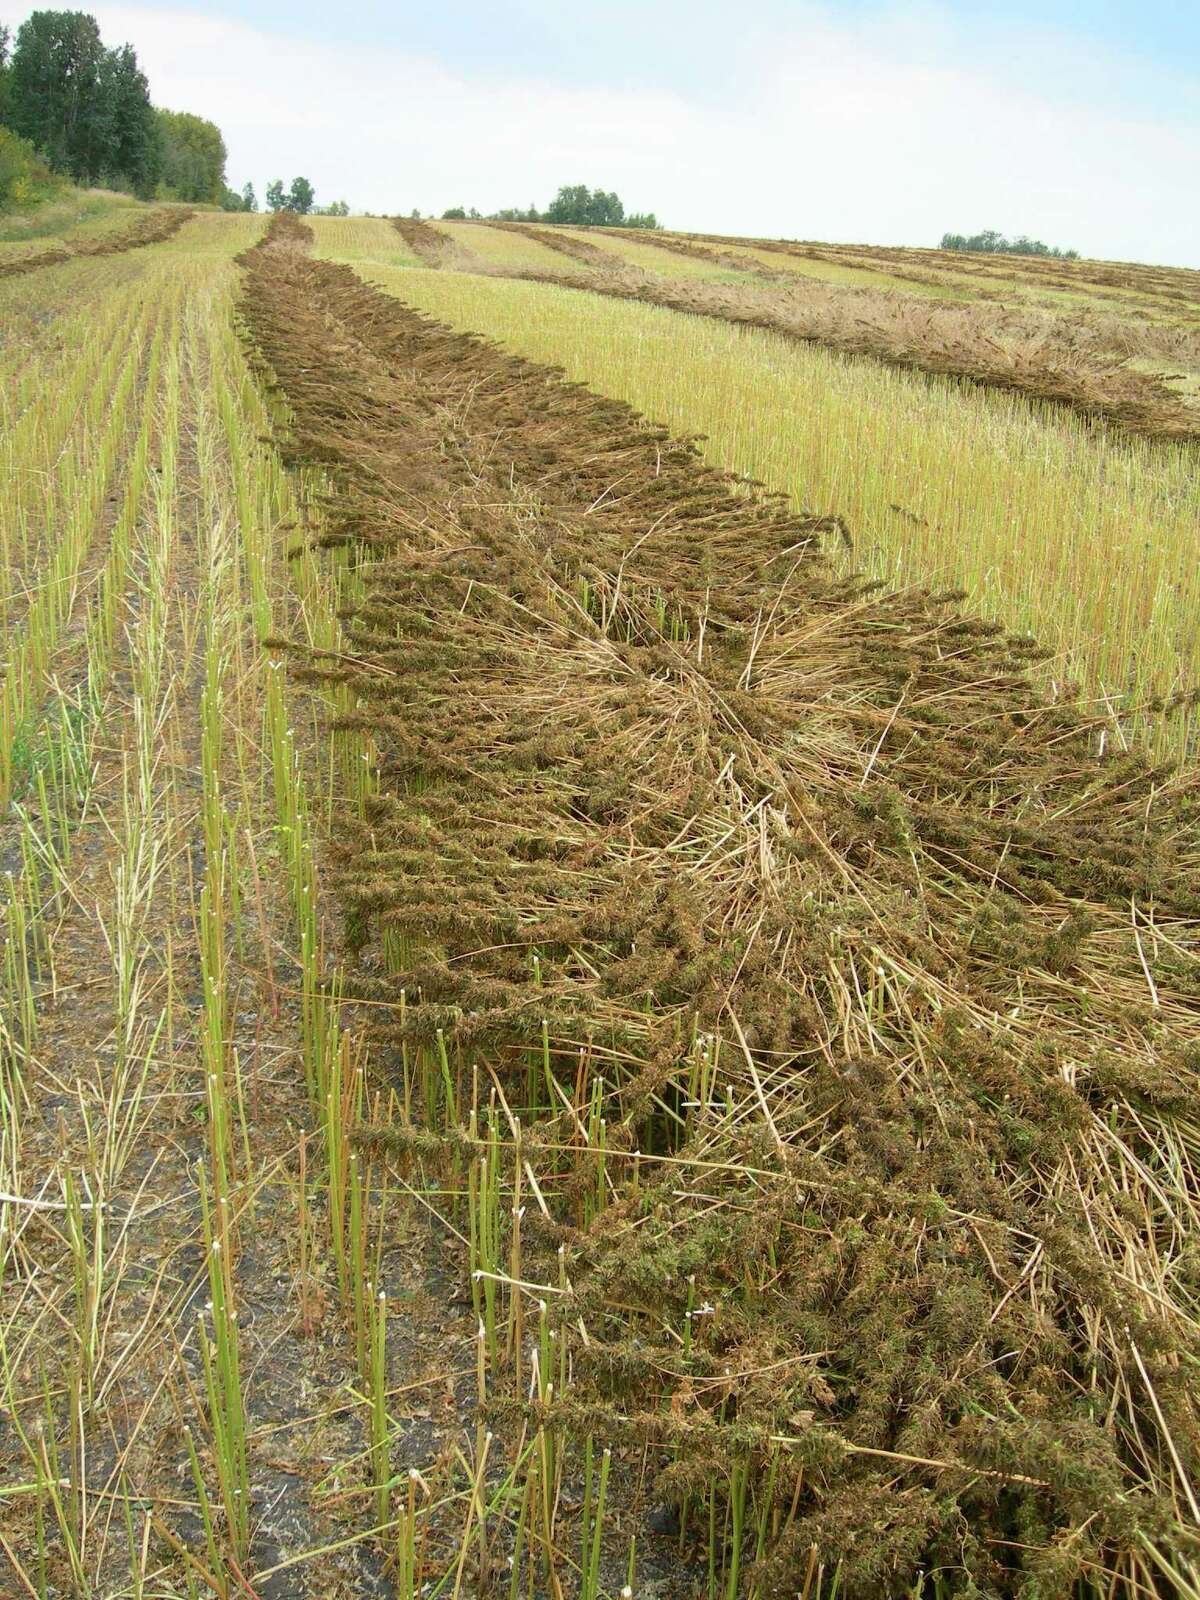 Hemp retting in the field. The process breaks down the natural glues binding fibers to the core of the hemp stalk.